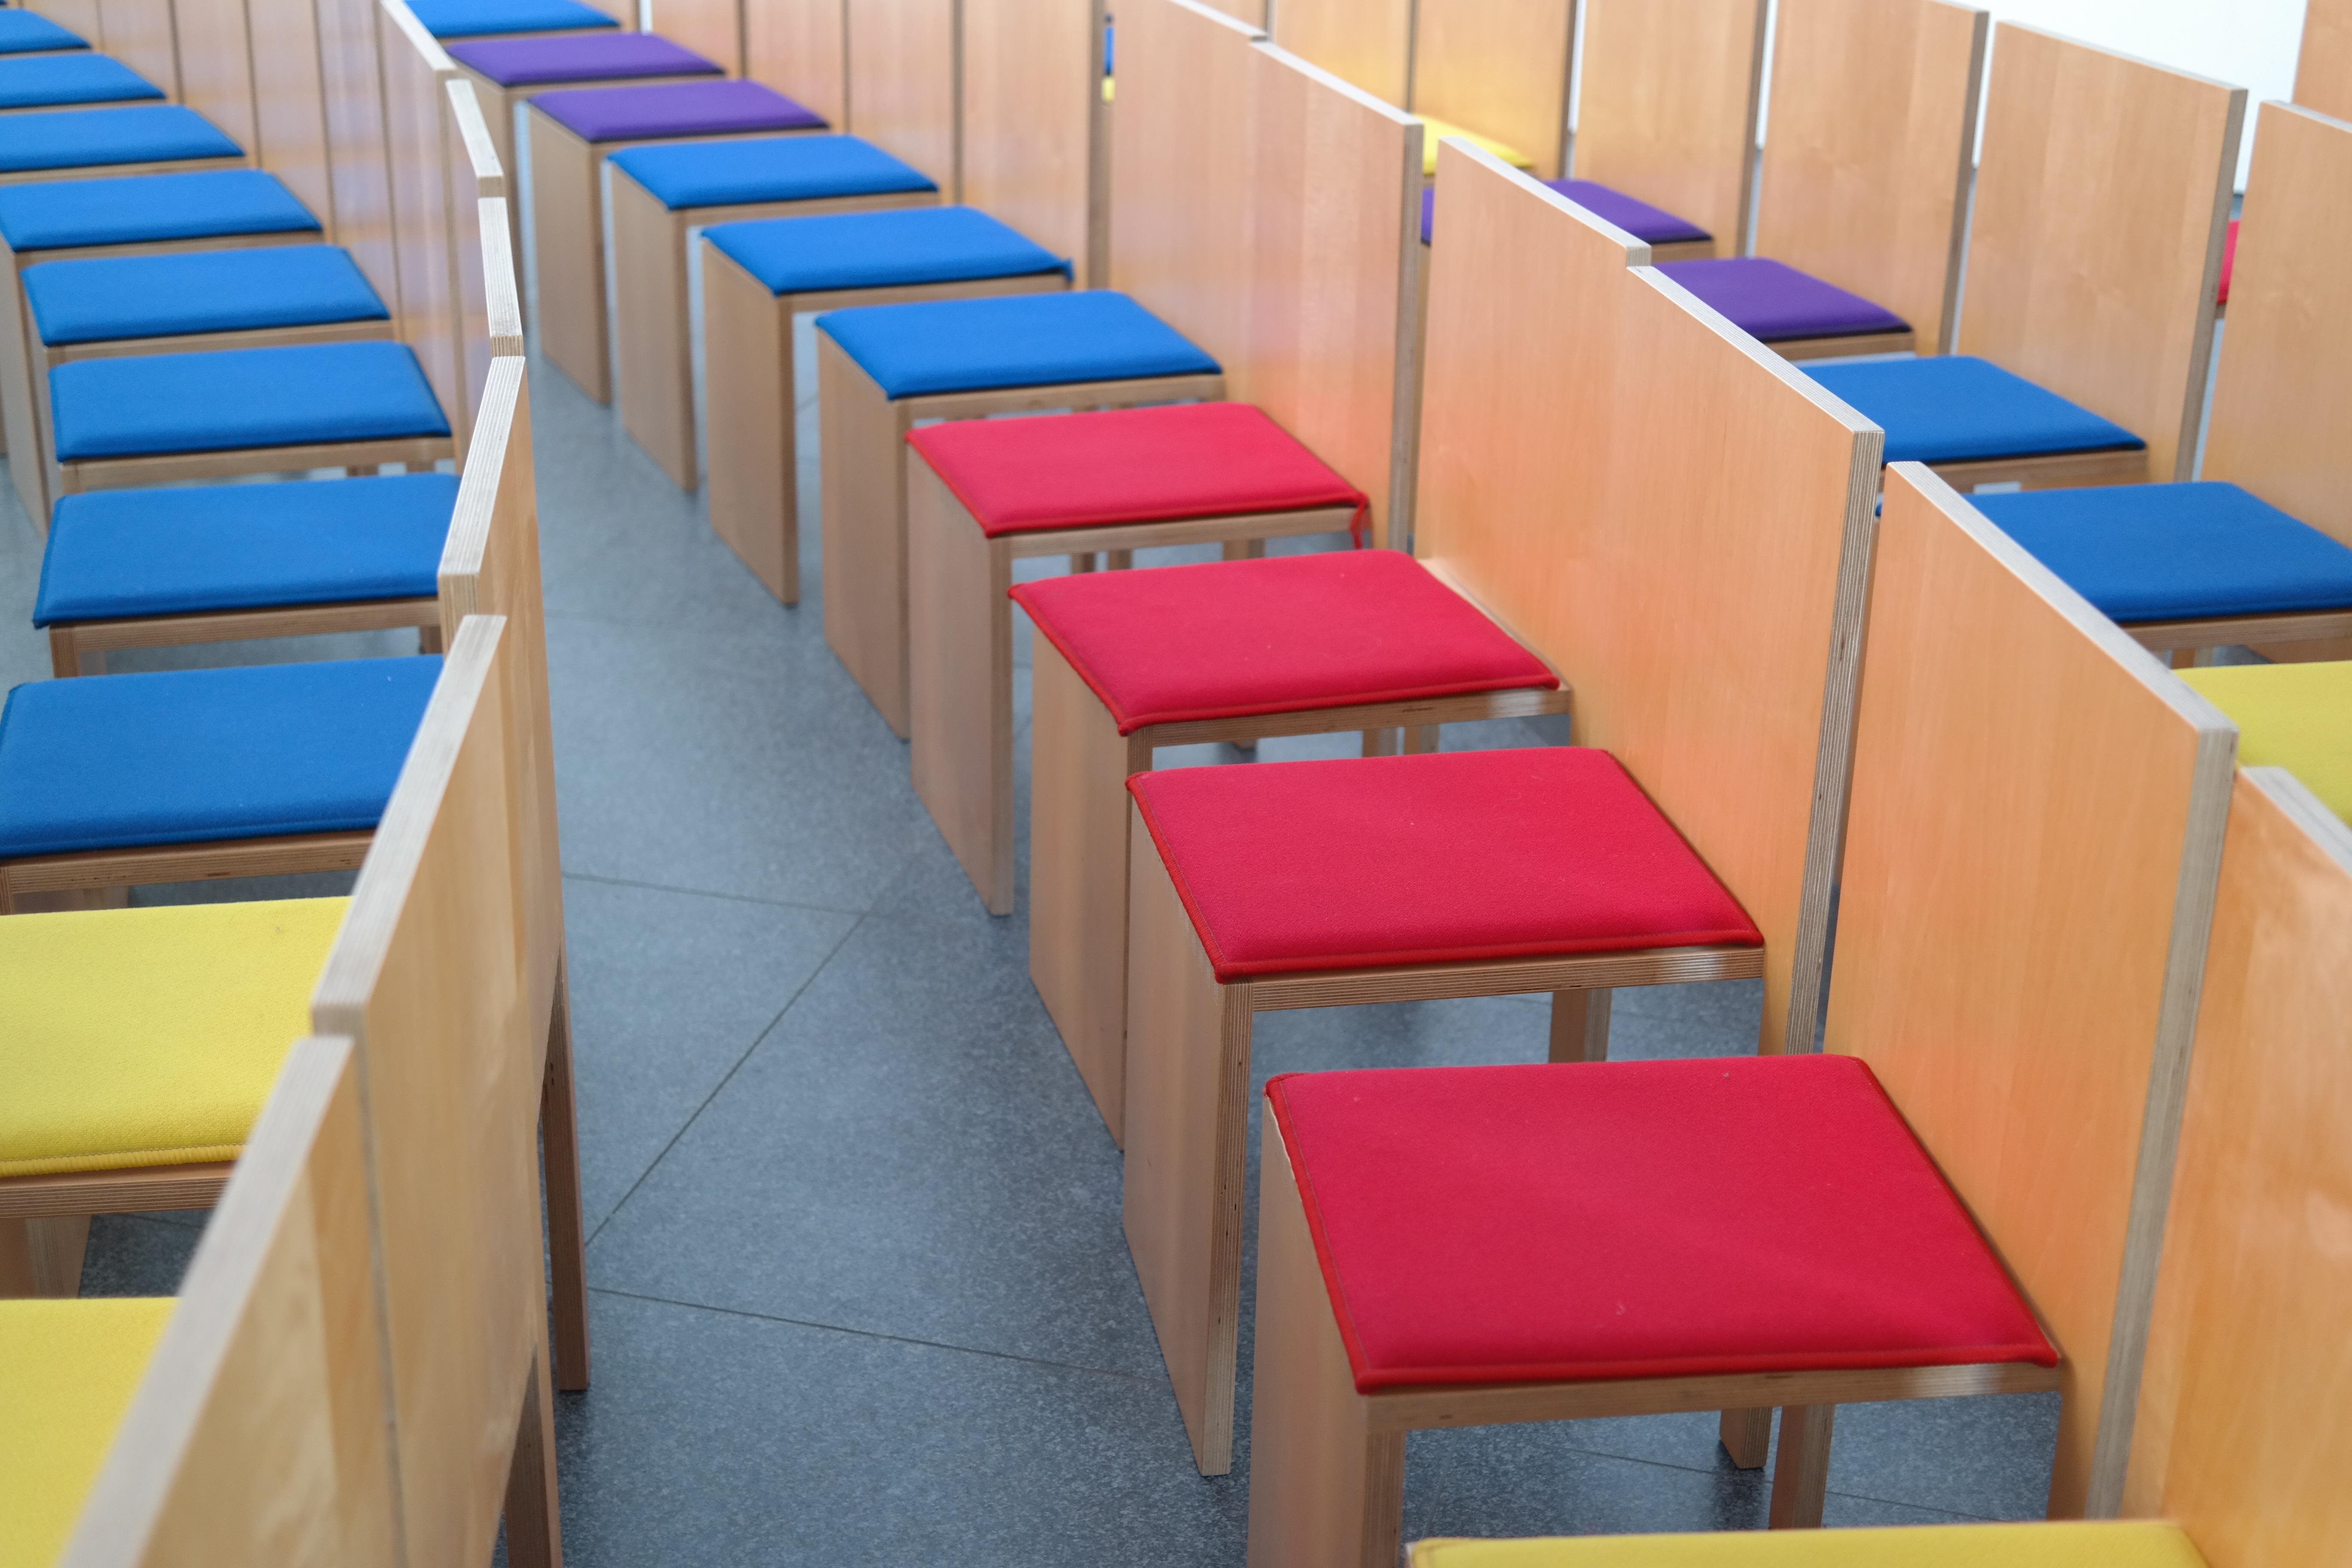 Fotos gratis : estructura, sala, asiento, rojo, azul, descanso ...